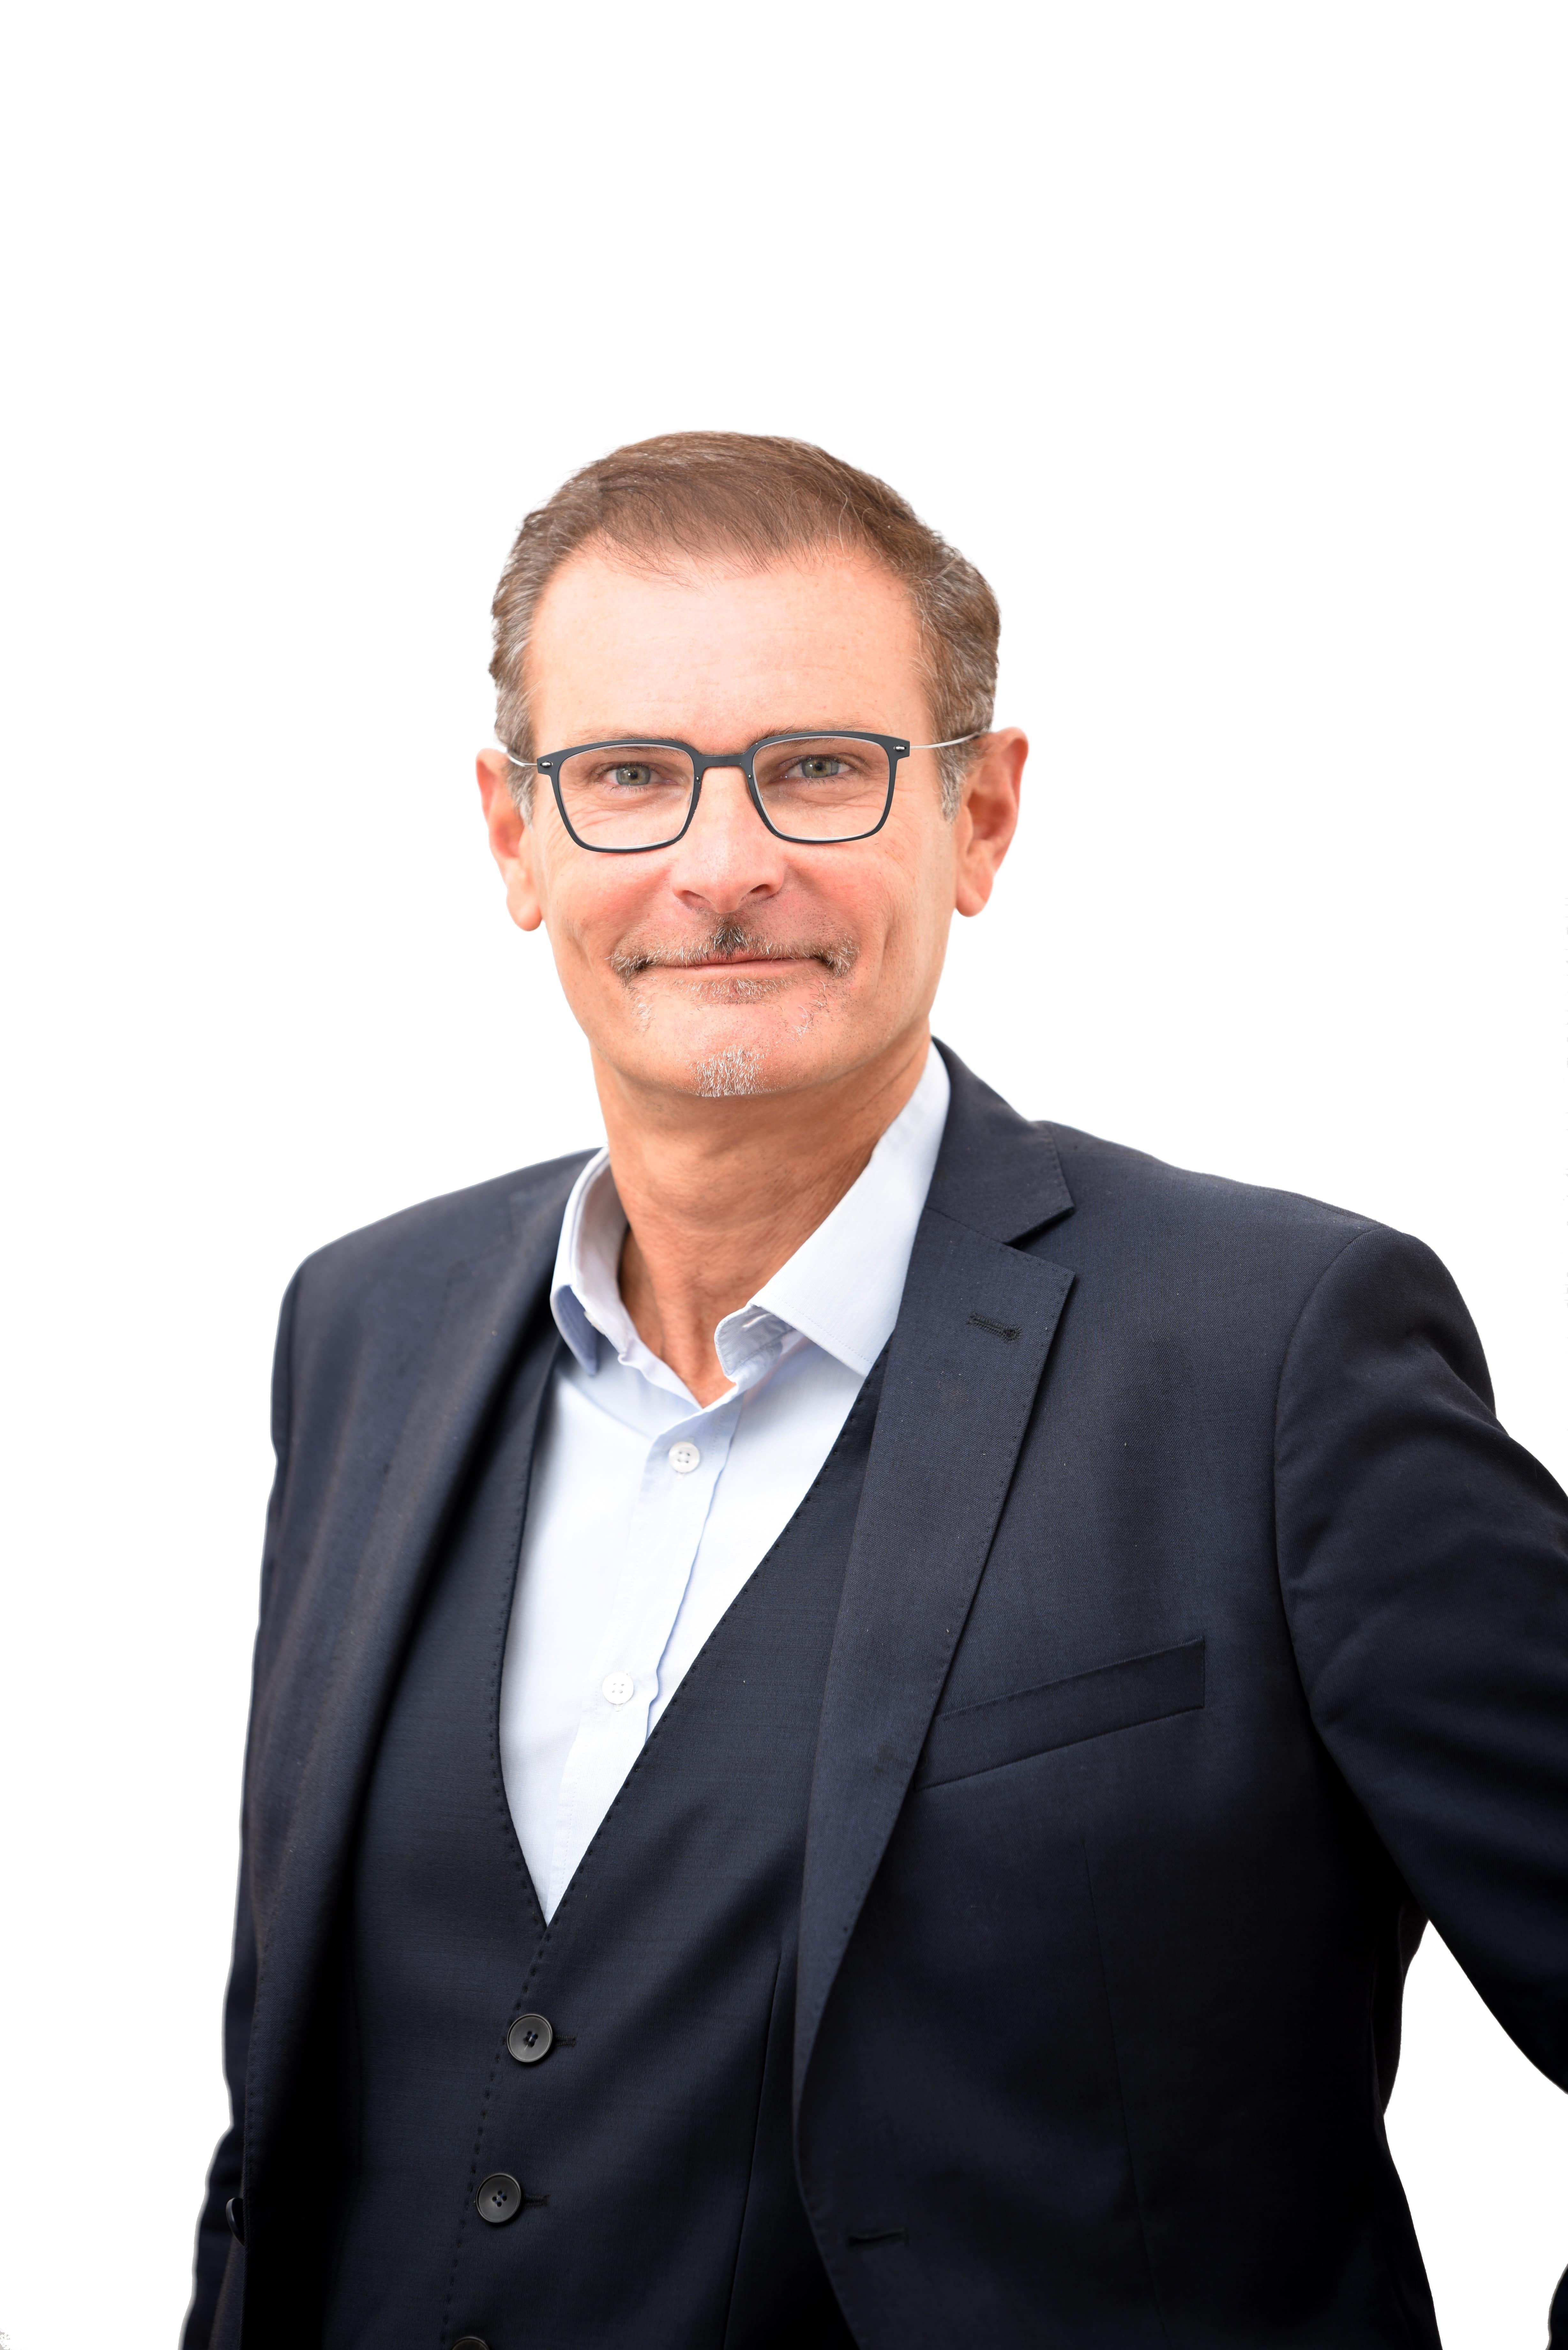 Jean-Michel Nogueroles